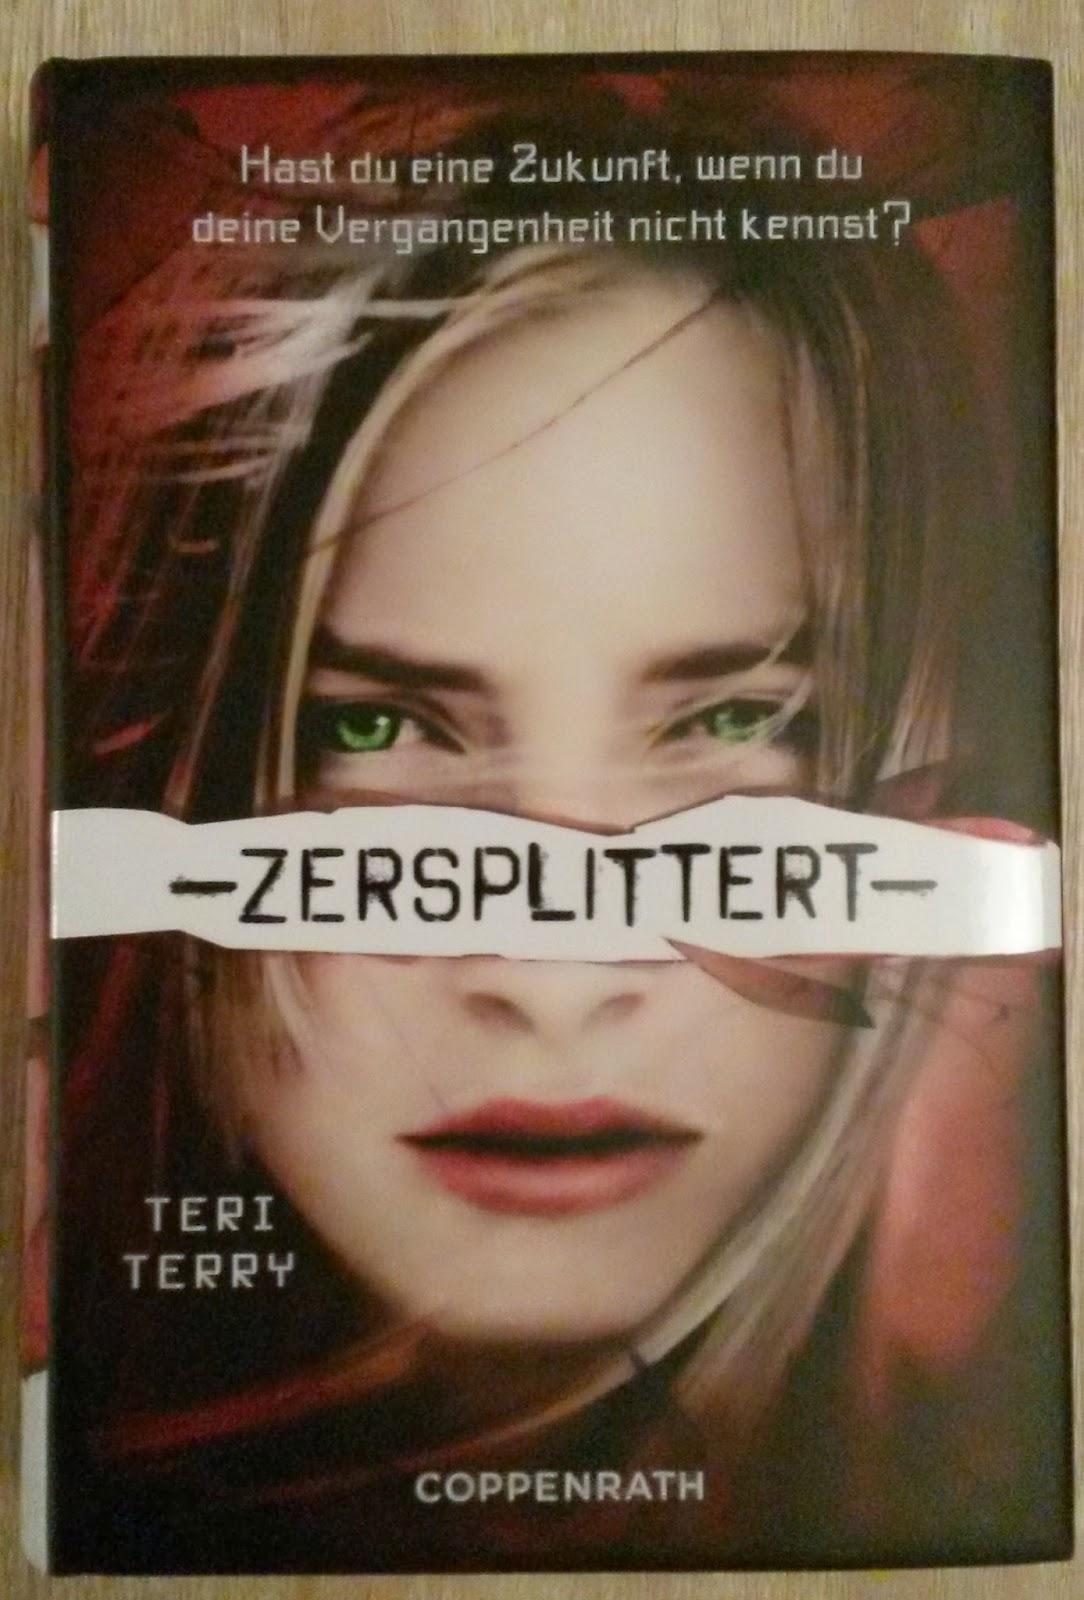 https://shop.coppenrath.de/produkt/61184/zersplittert/geschenke-buecher-fuer-jugendliche/buchwelt/